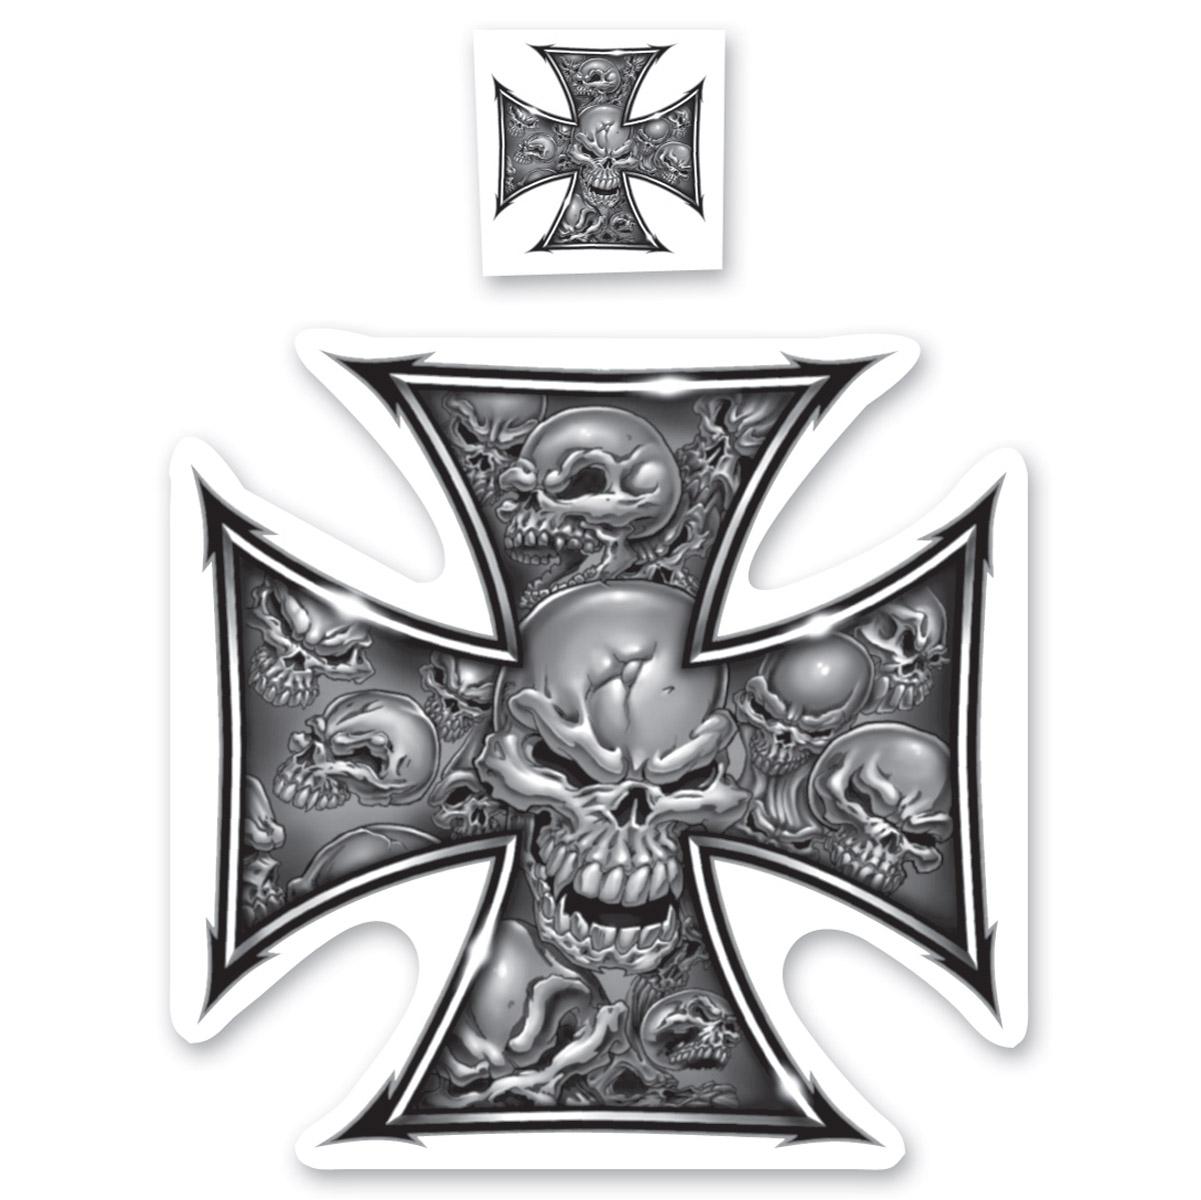 Lethal Threat Rude & Crude Iron Cross Mini Decal